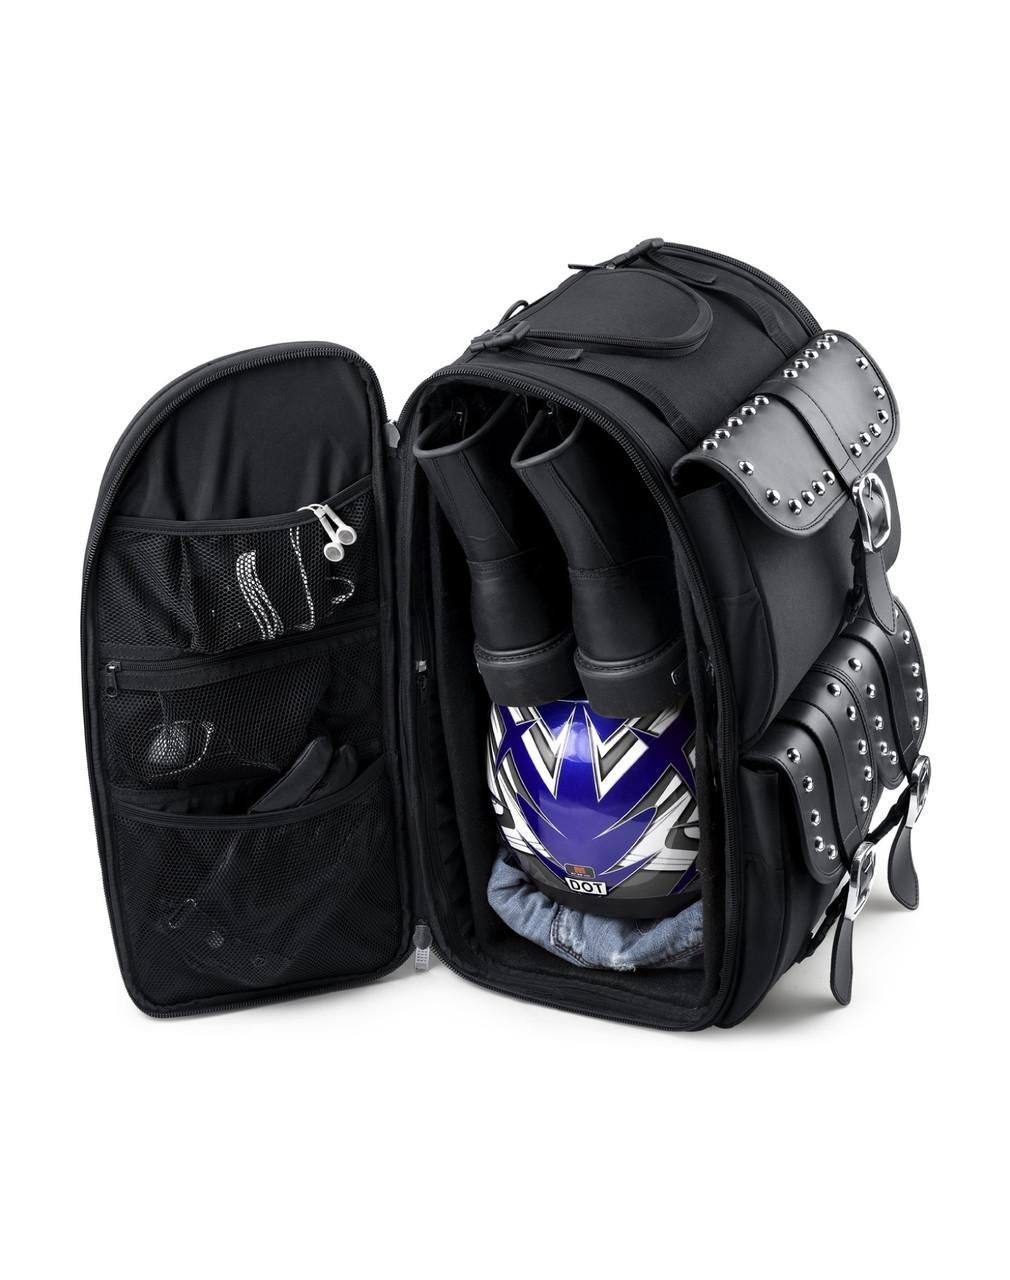 Suzuki Viking Extra Large Studded Motorcycle Tail Bag Storage View